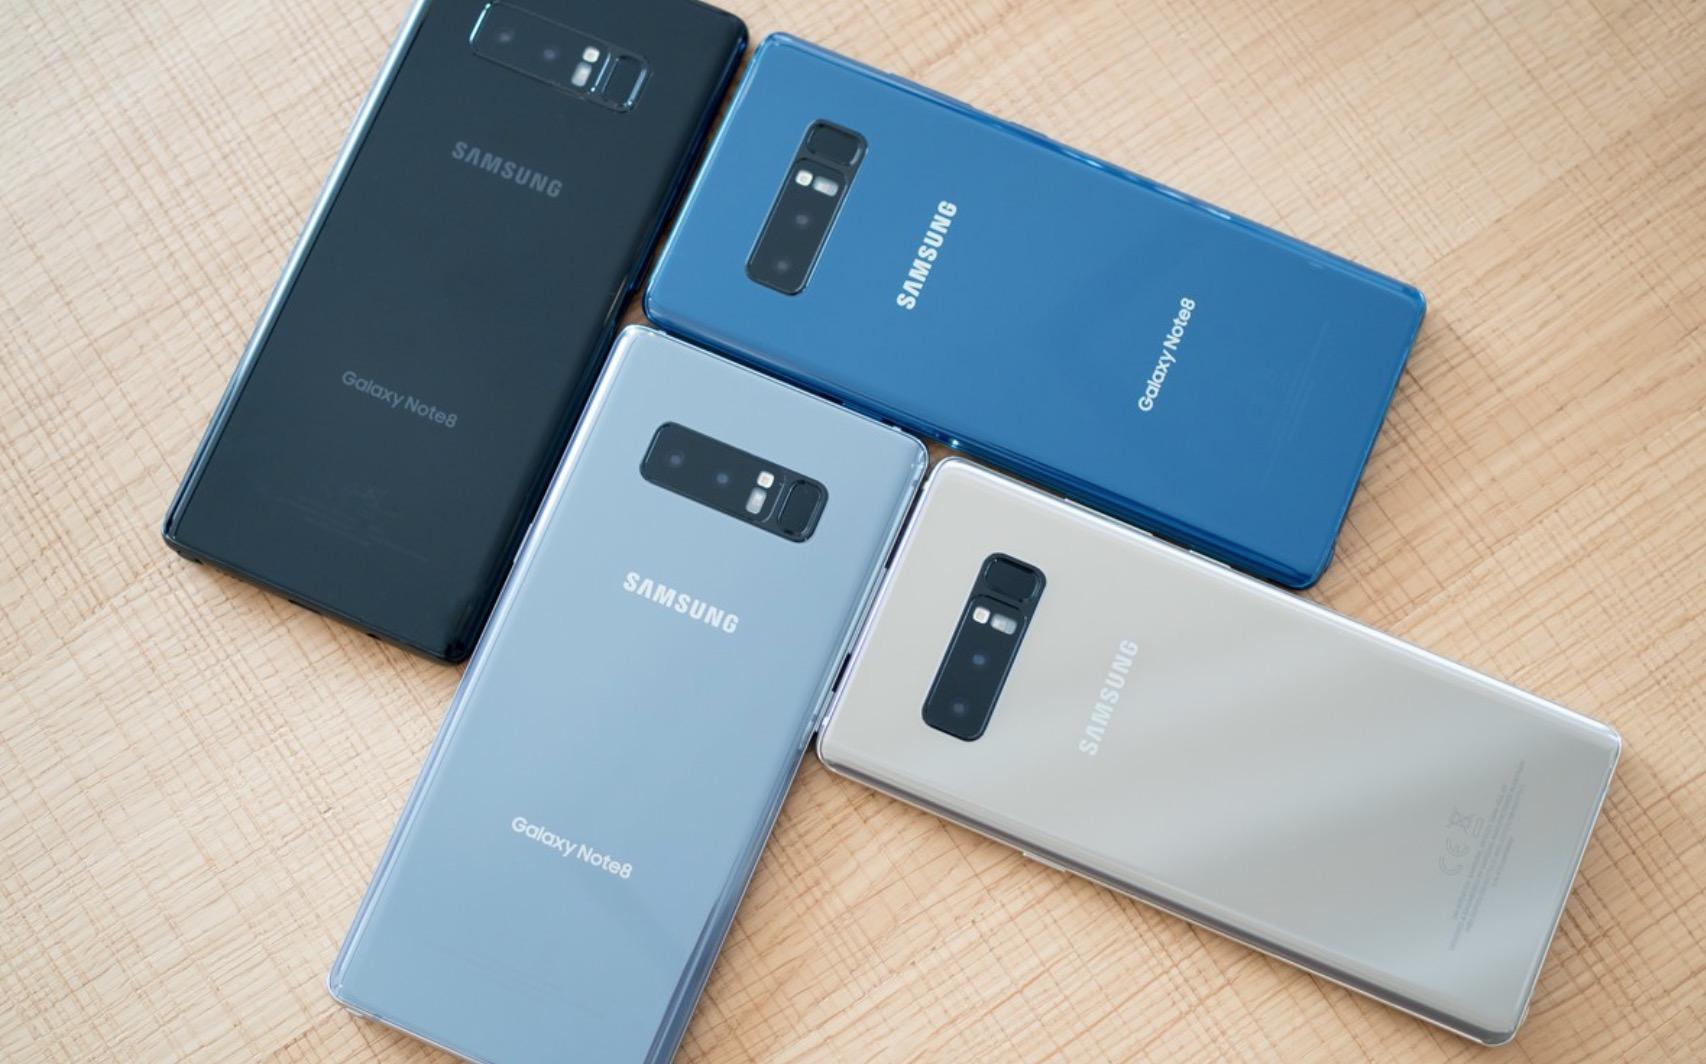 Samsung Galaxy Note 8 sistema a confronto